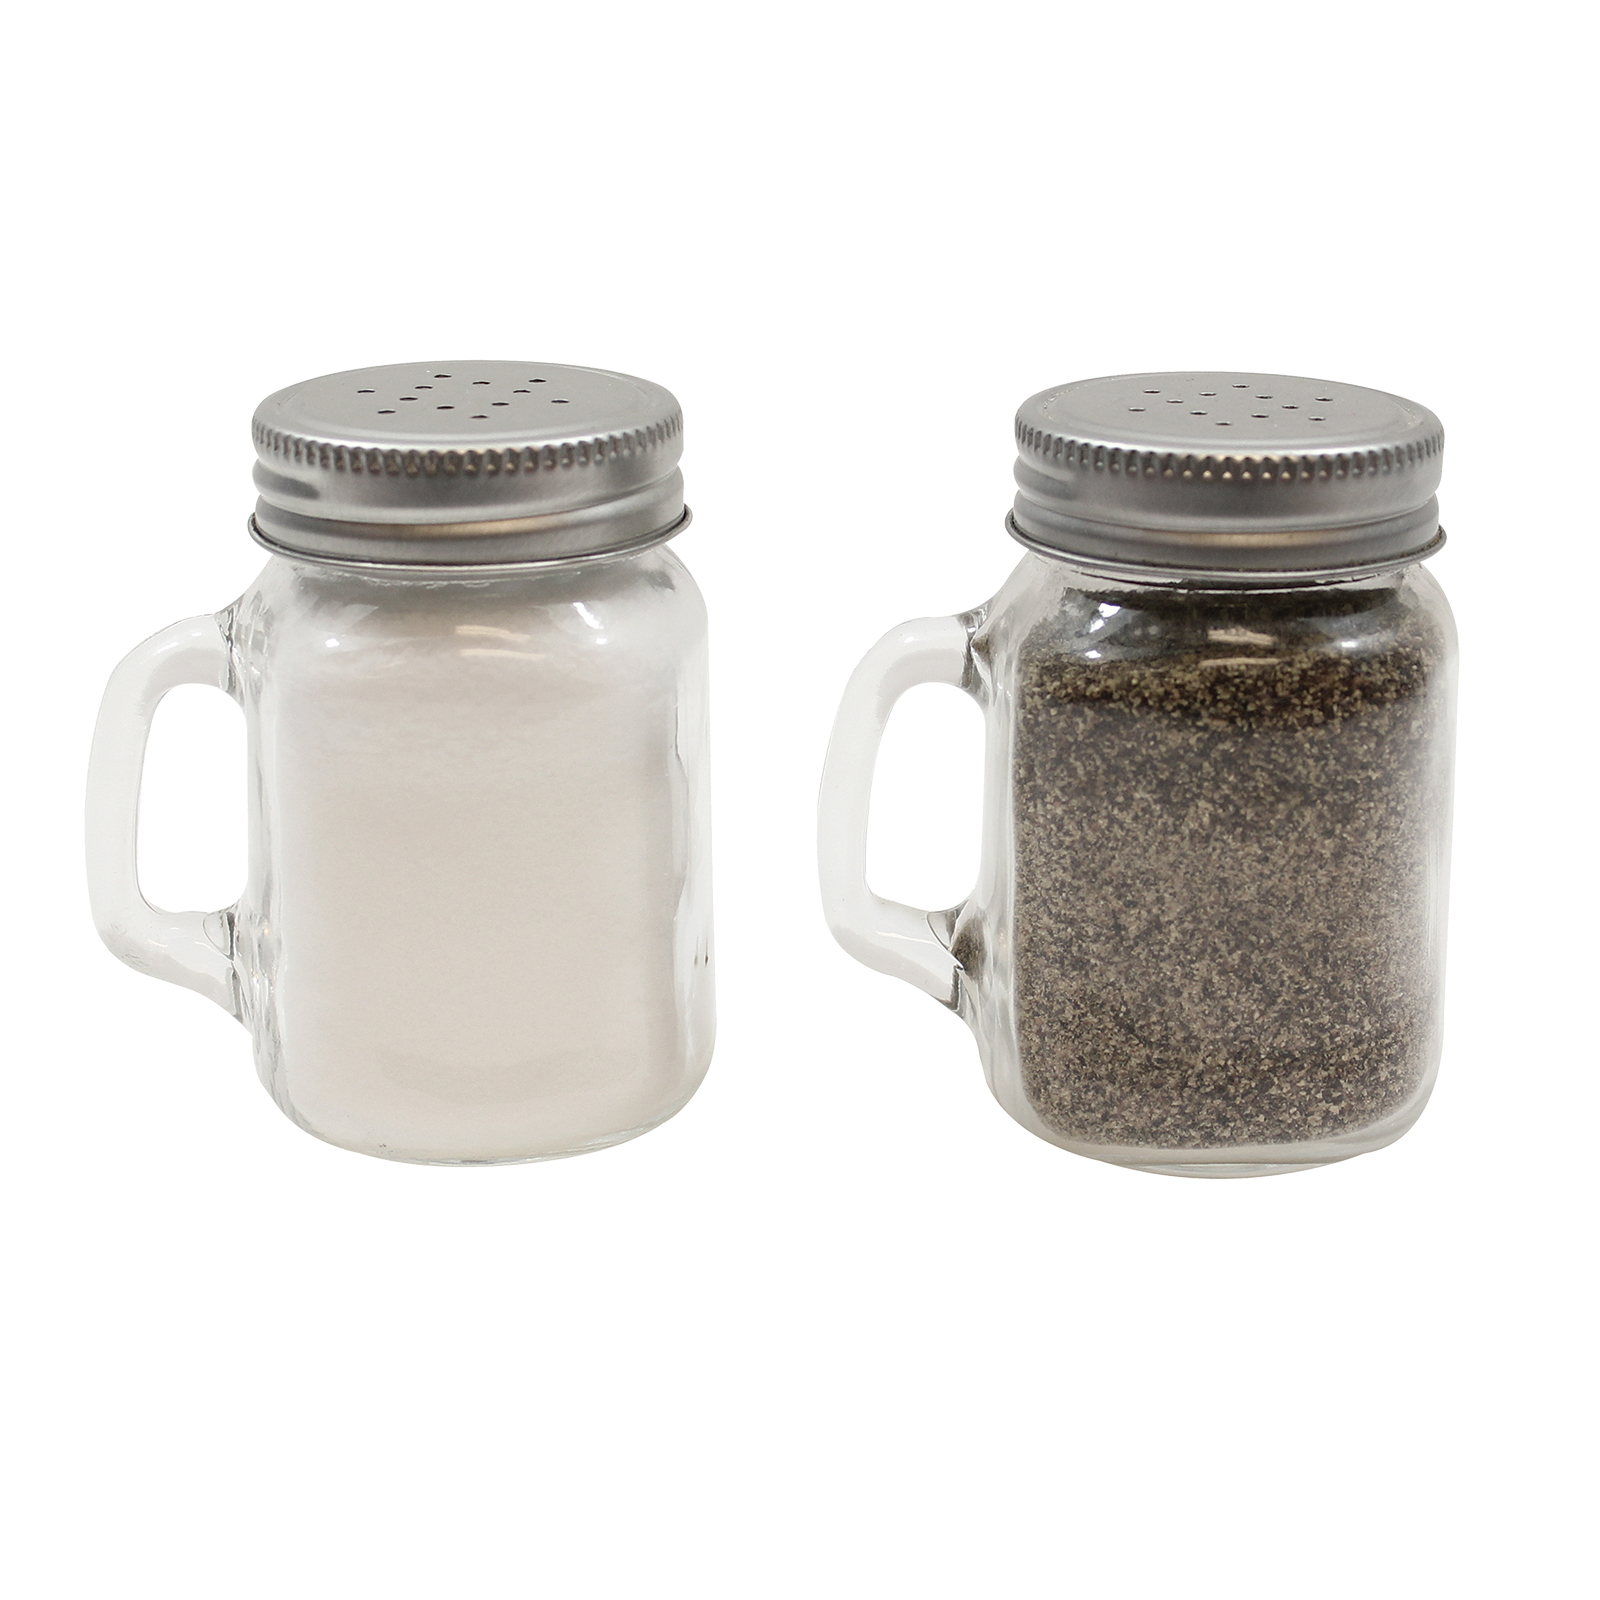 TableCraft Products H475S&P salt / pepper shaker